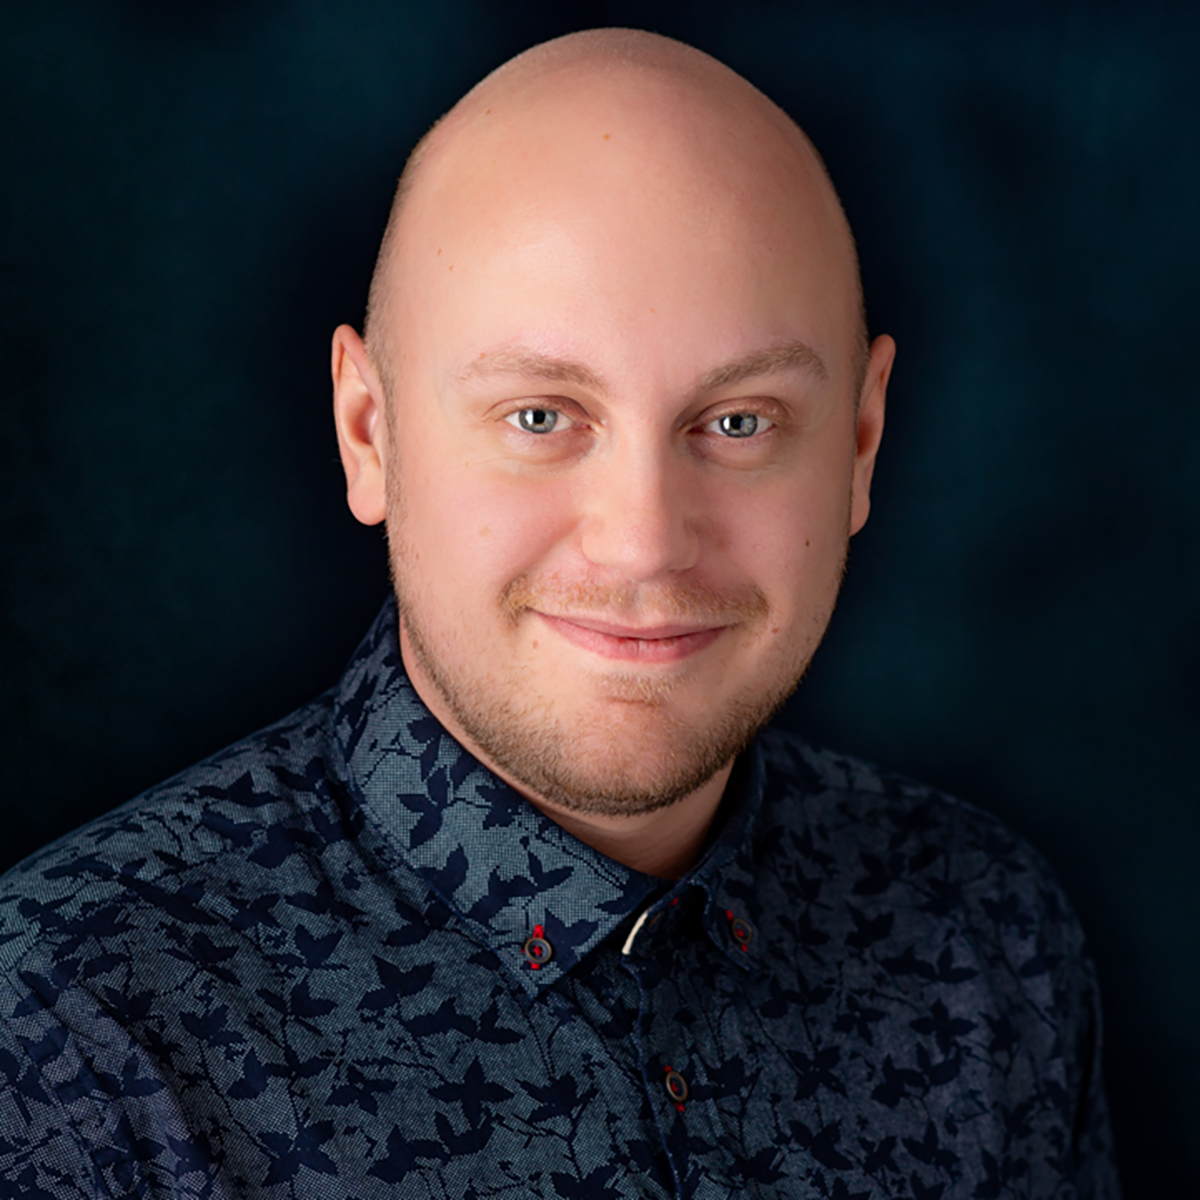 Ole-Alexander Reinfjell